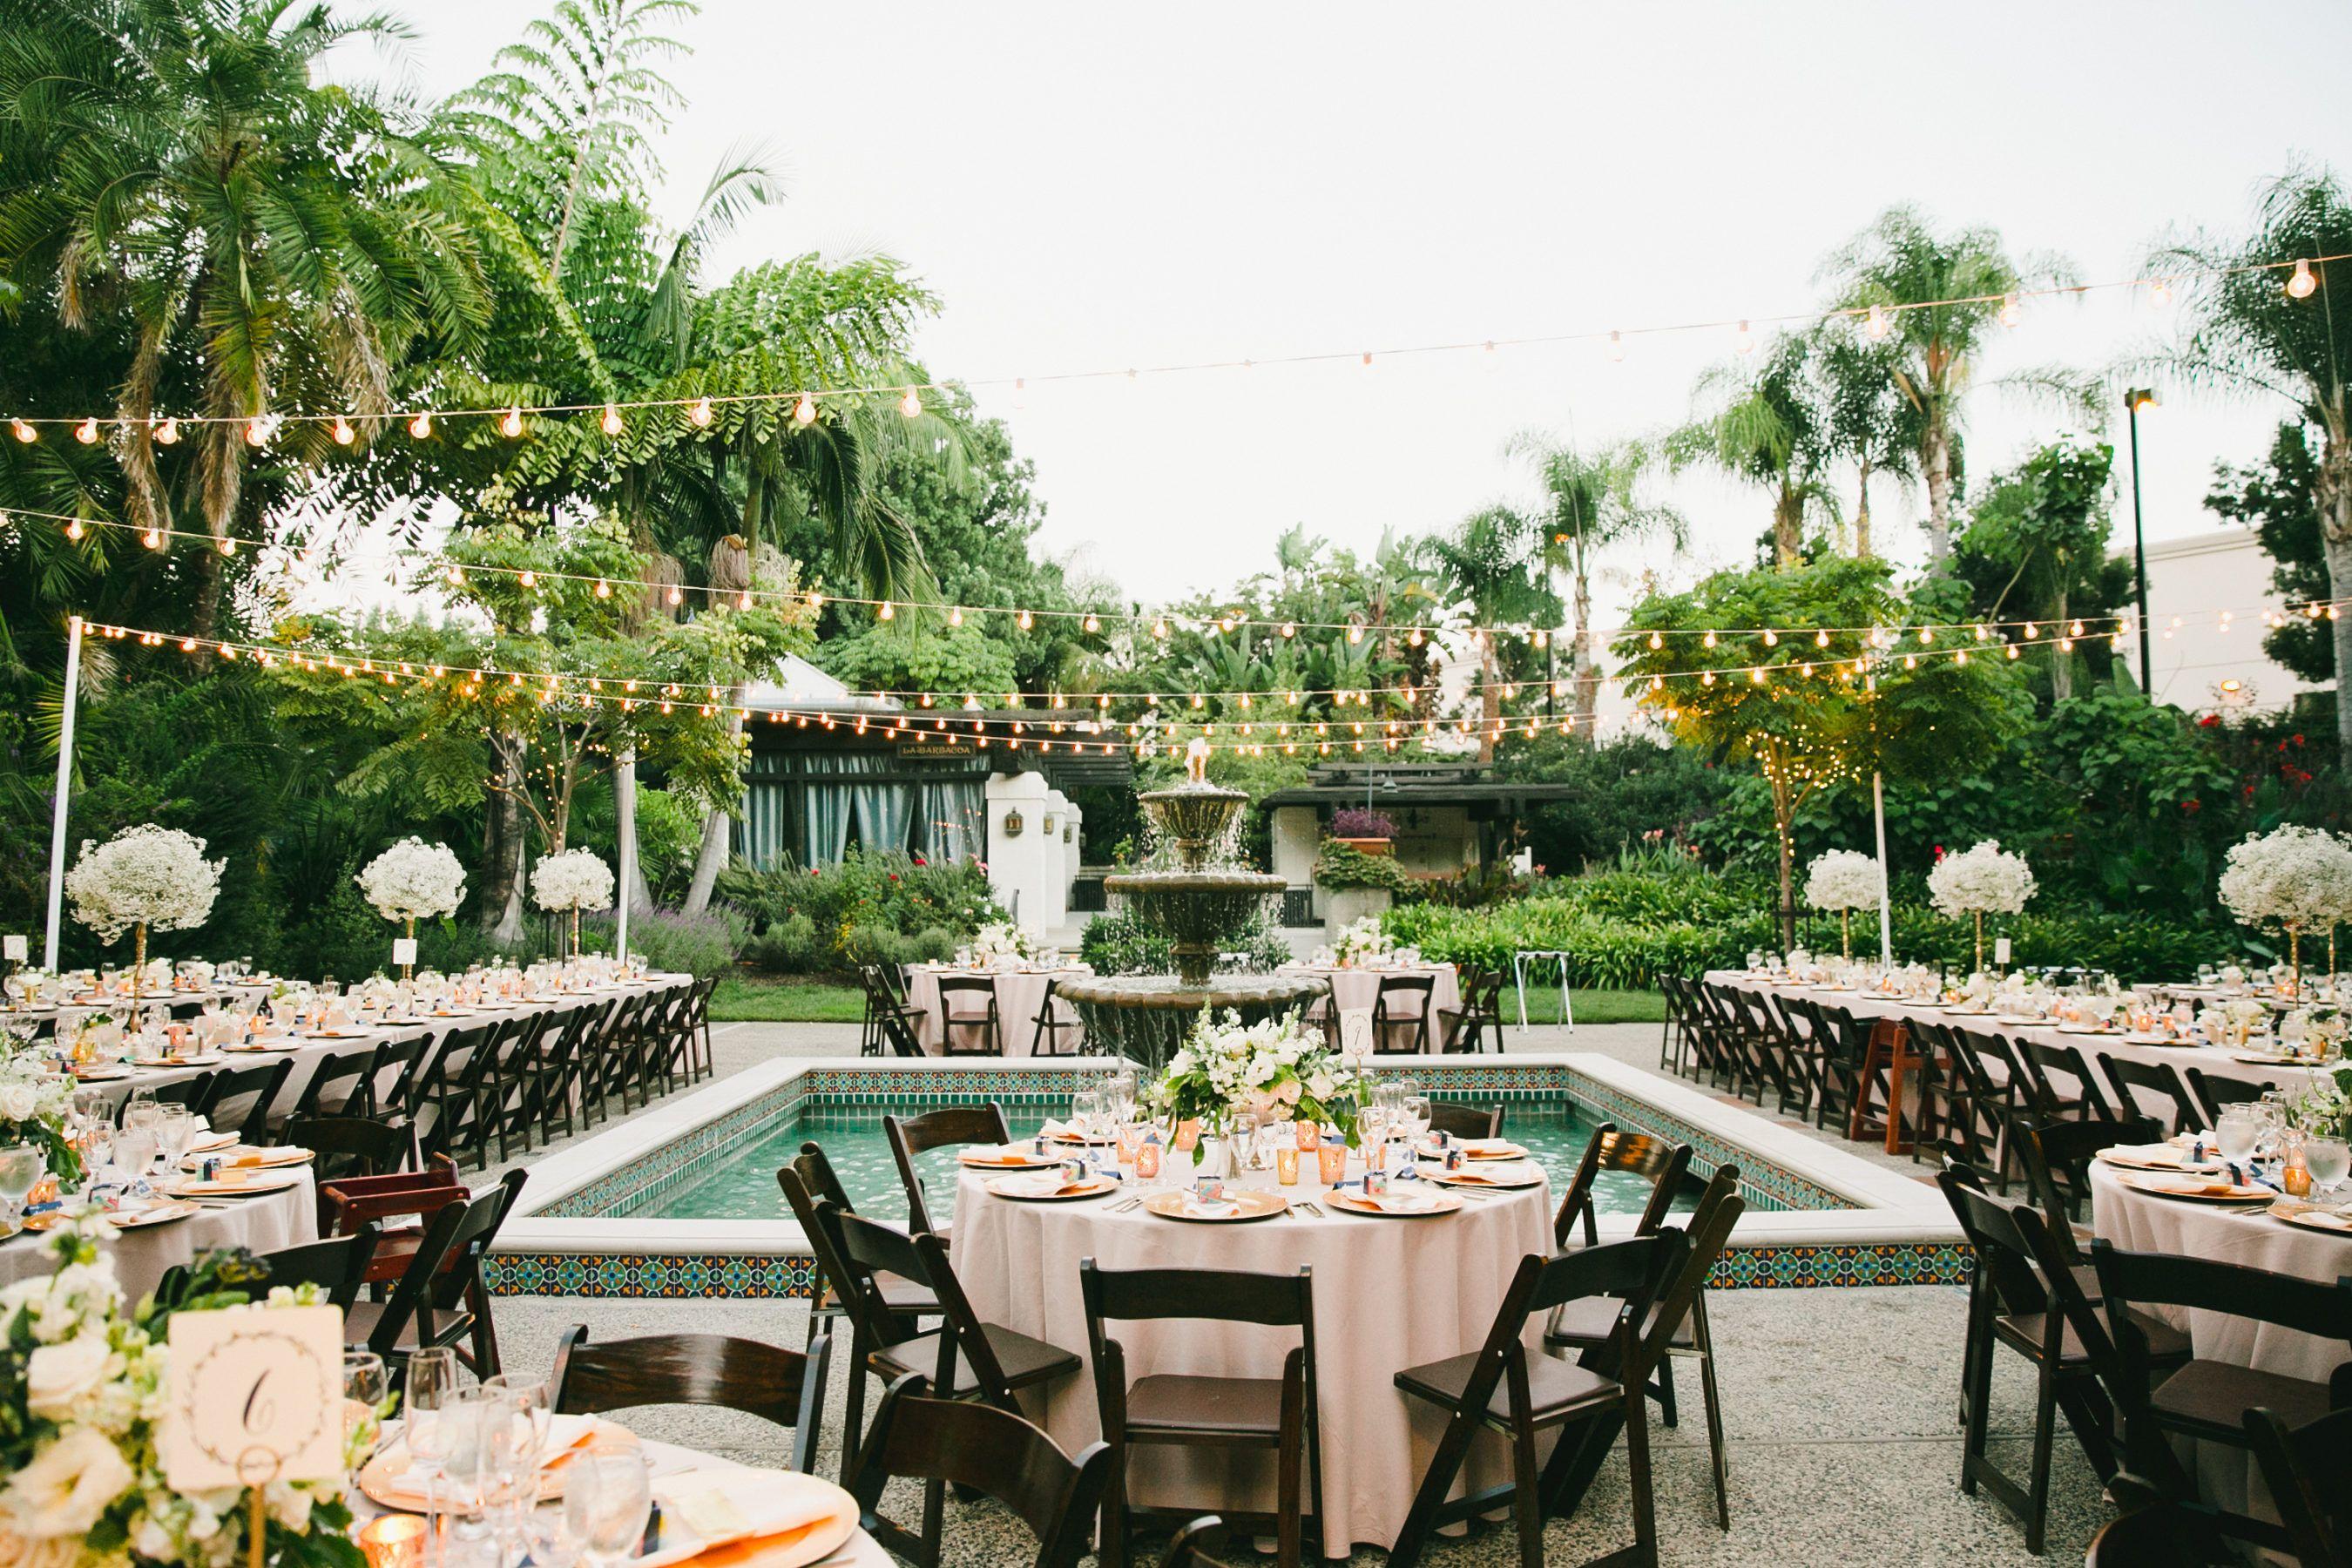 Los Angeles Glam Romance Garden Wedding In 2020 Wedding